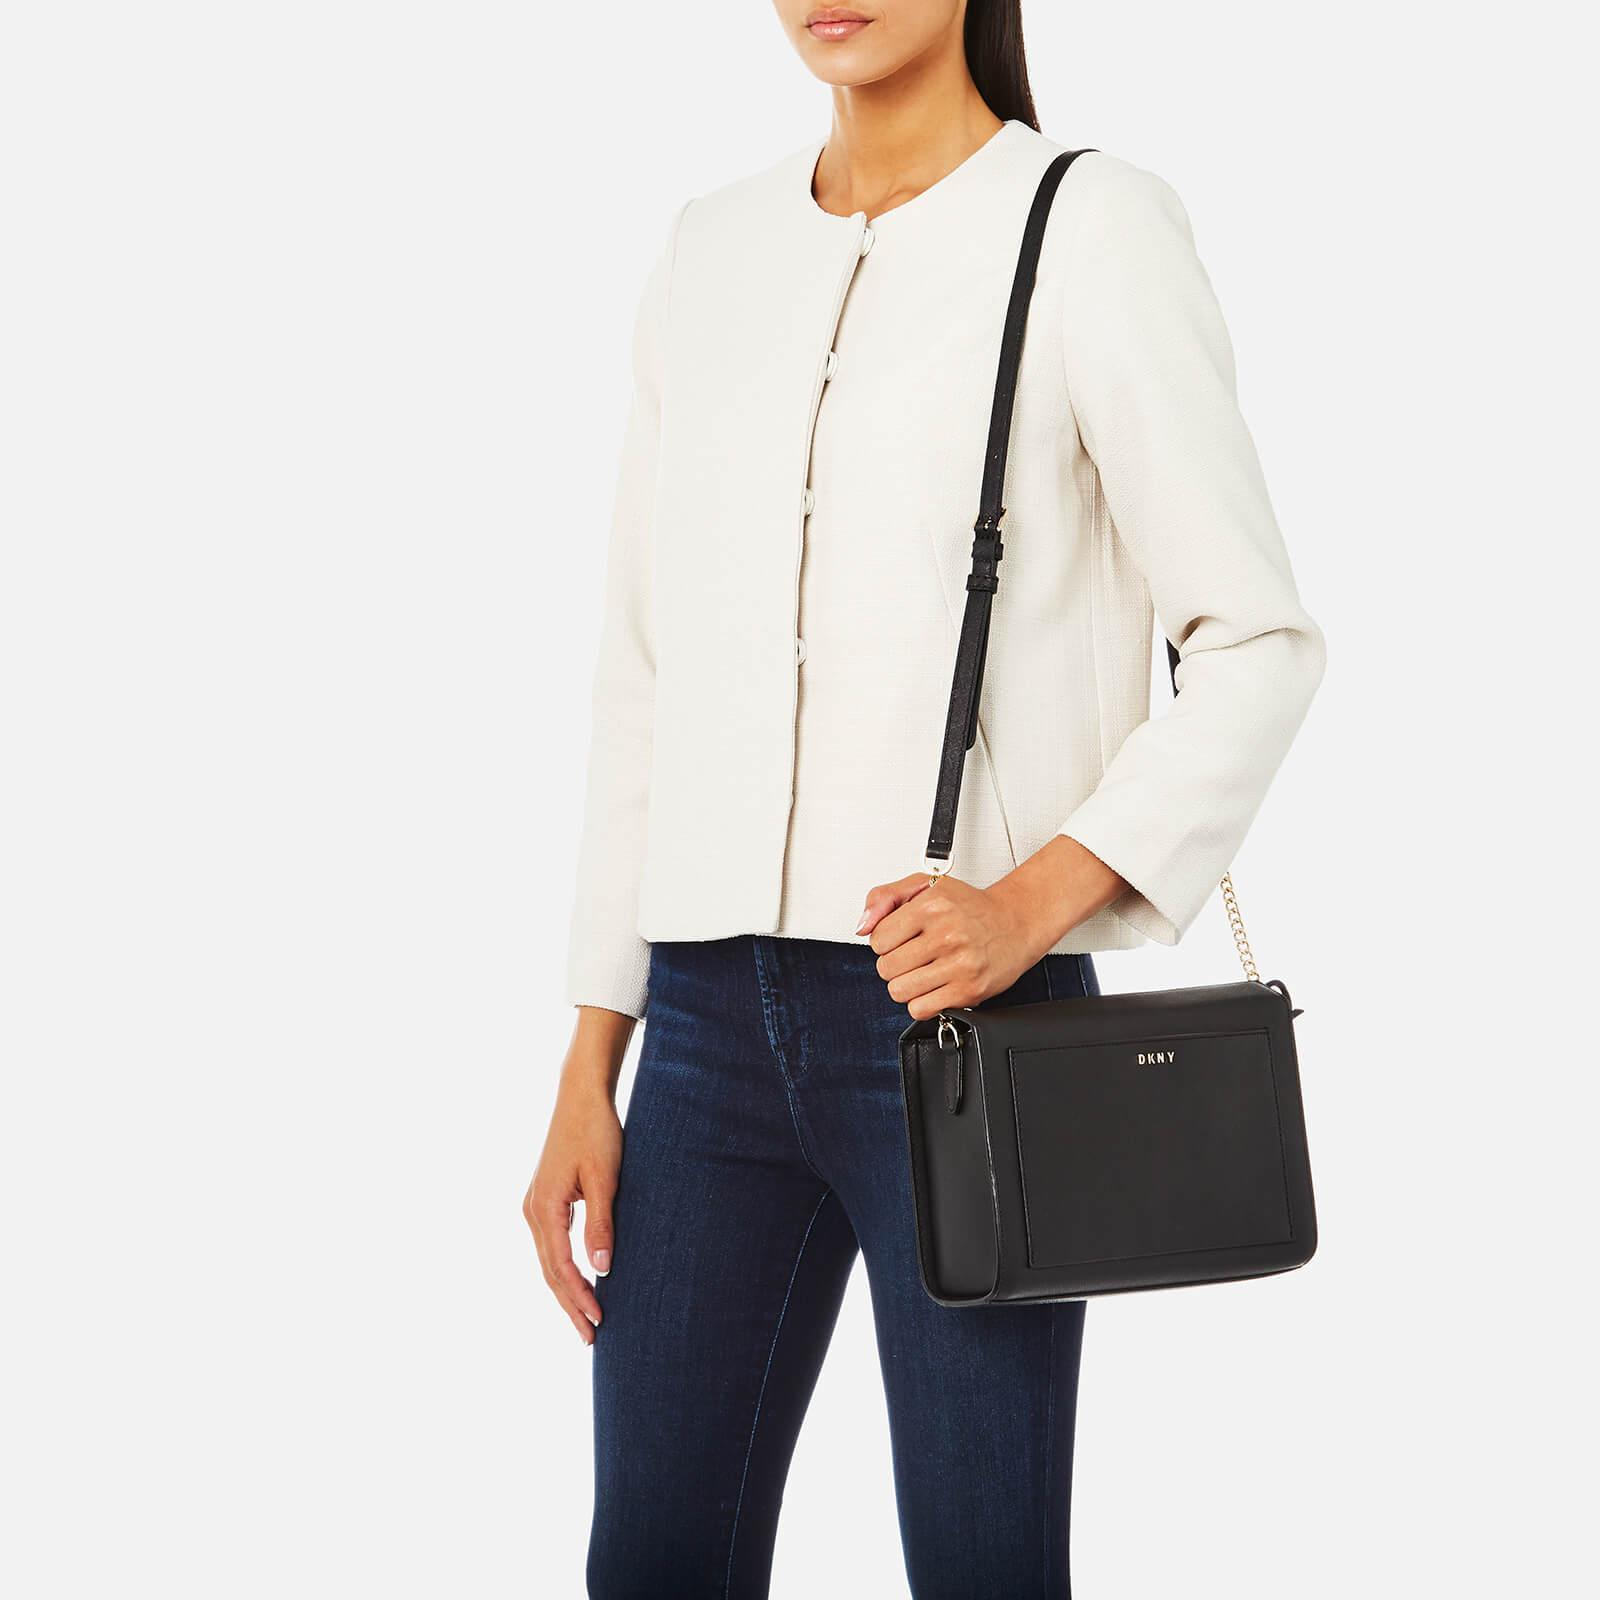 a902cfb202f1 Lyst - DKNY Bryant Park Medium Box Cross Body Bag